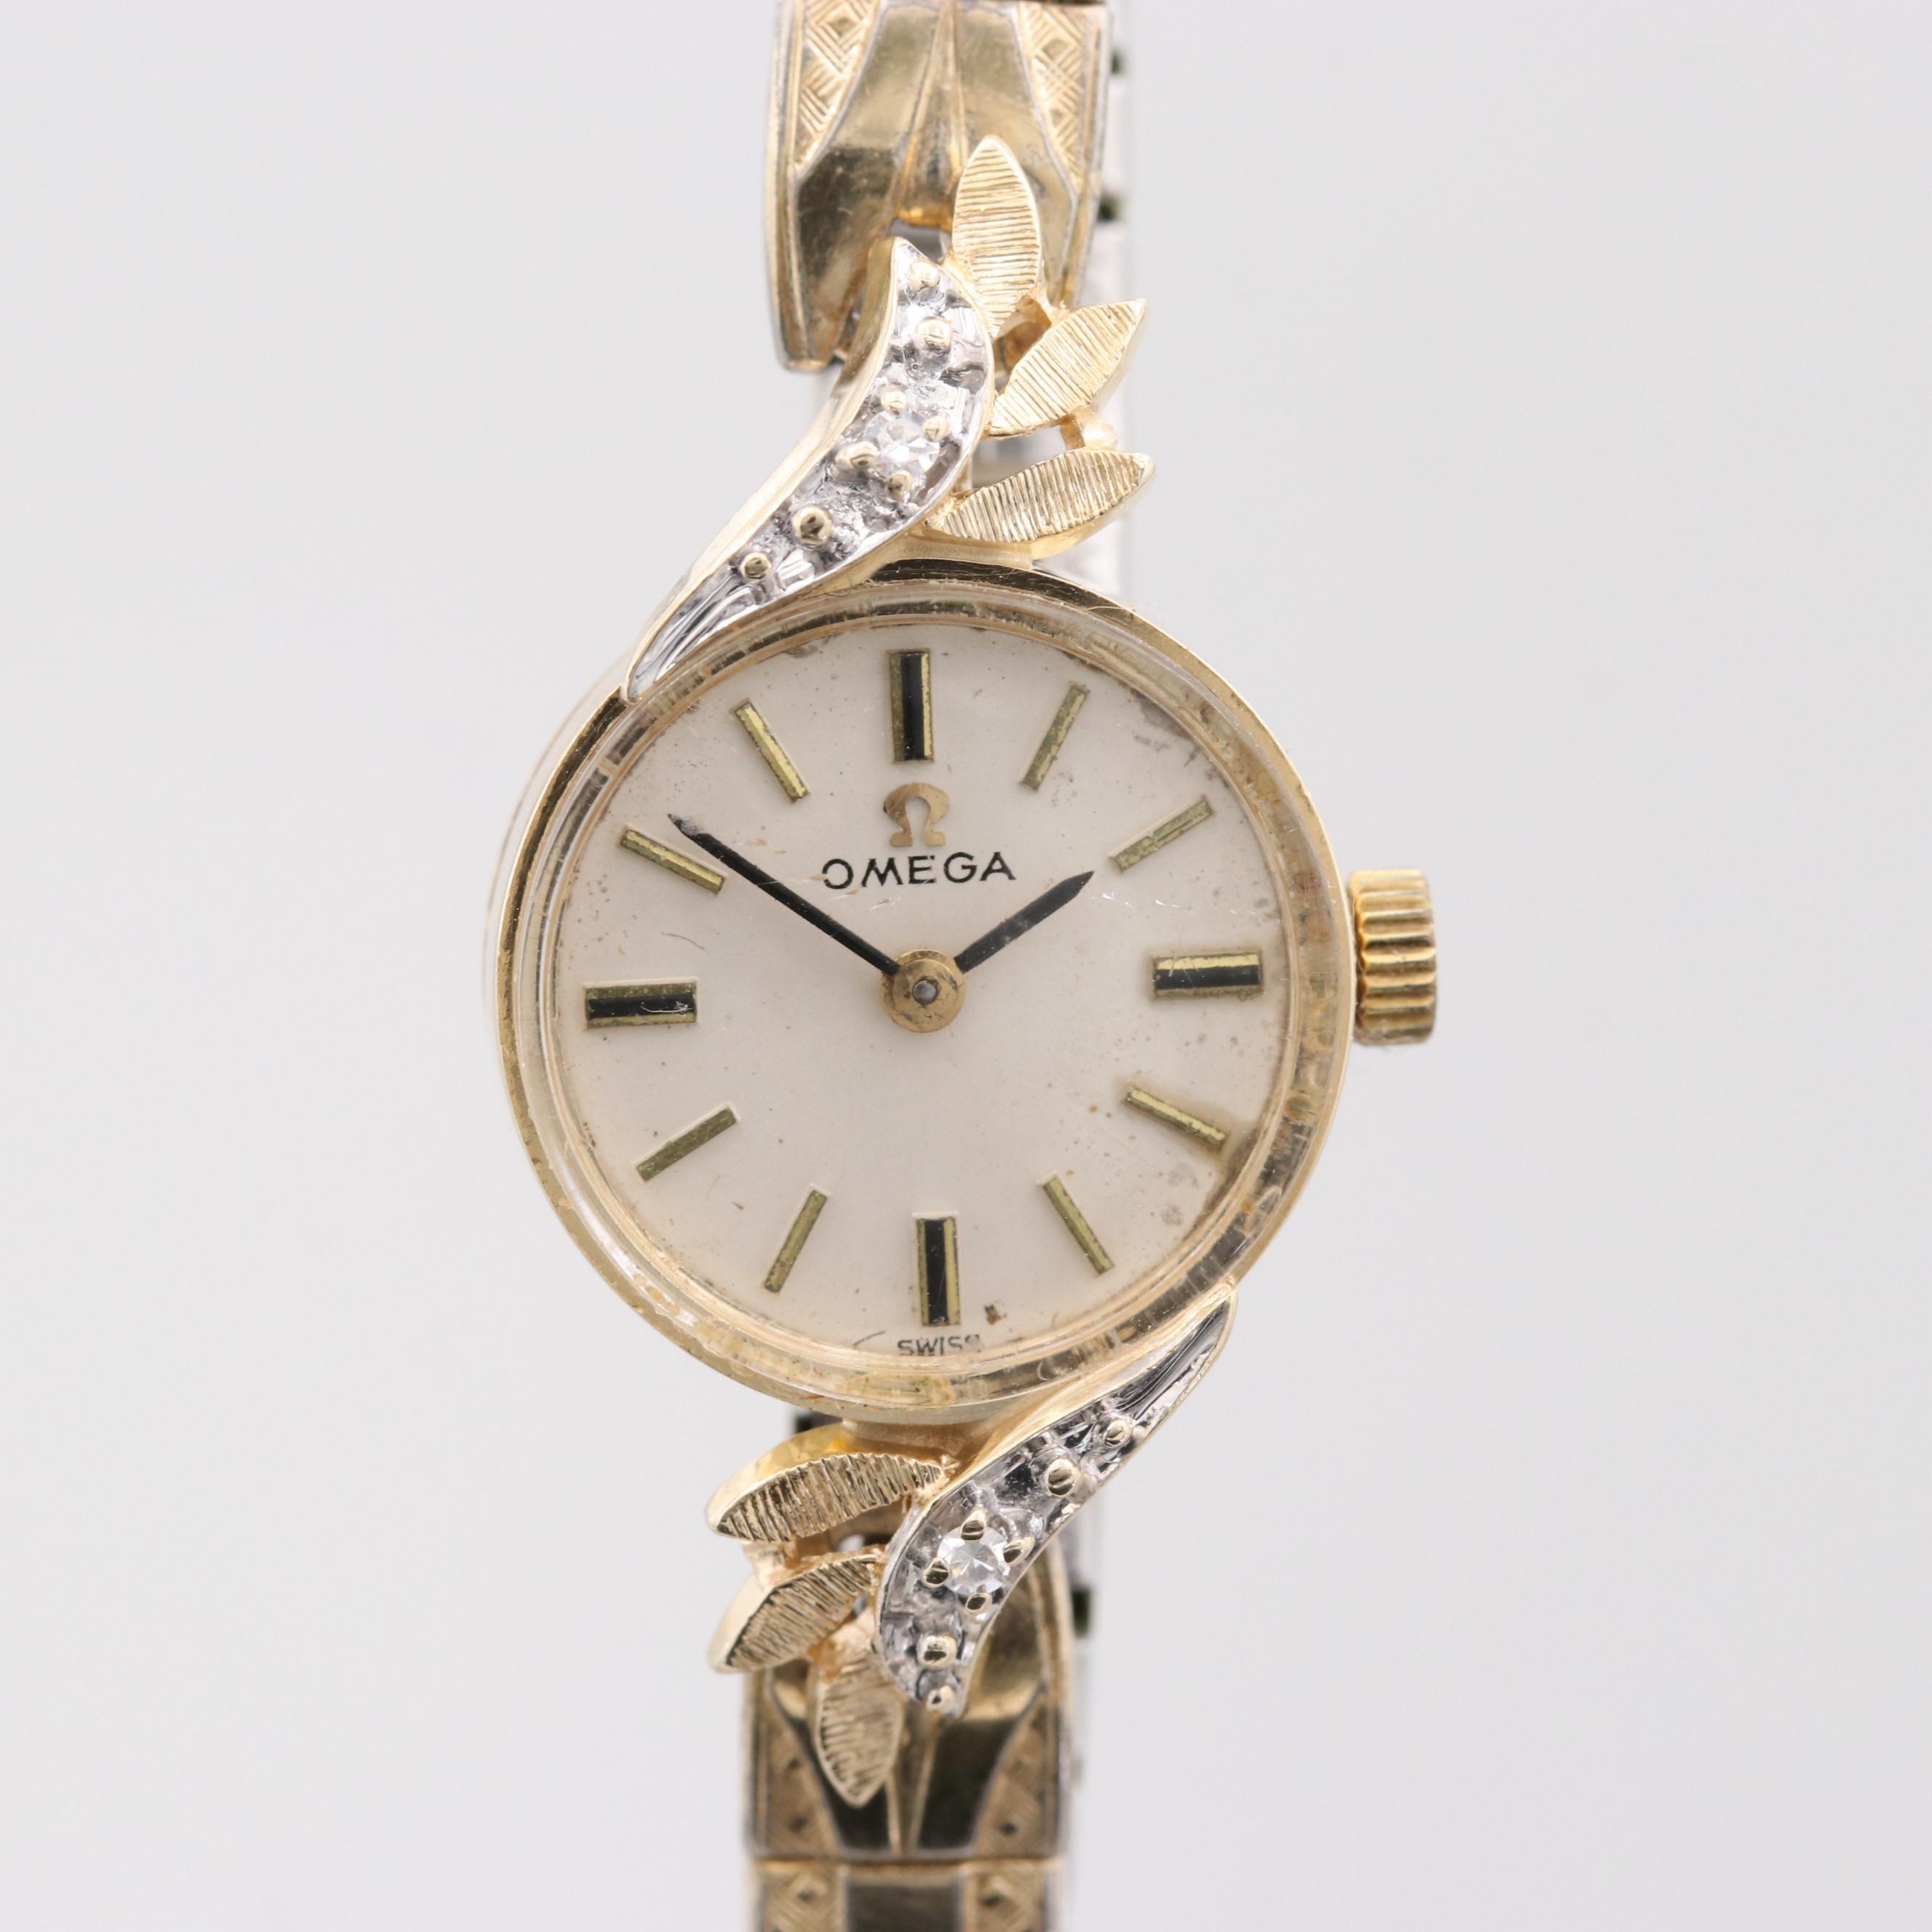 Omega 14K Yellow Gold Wristwatch with Diamond Foliate Case